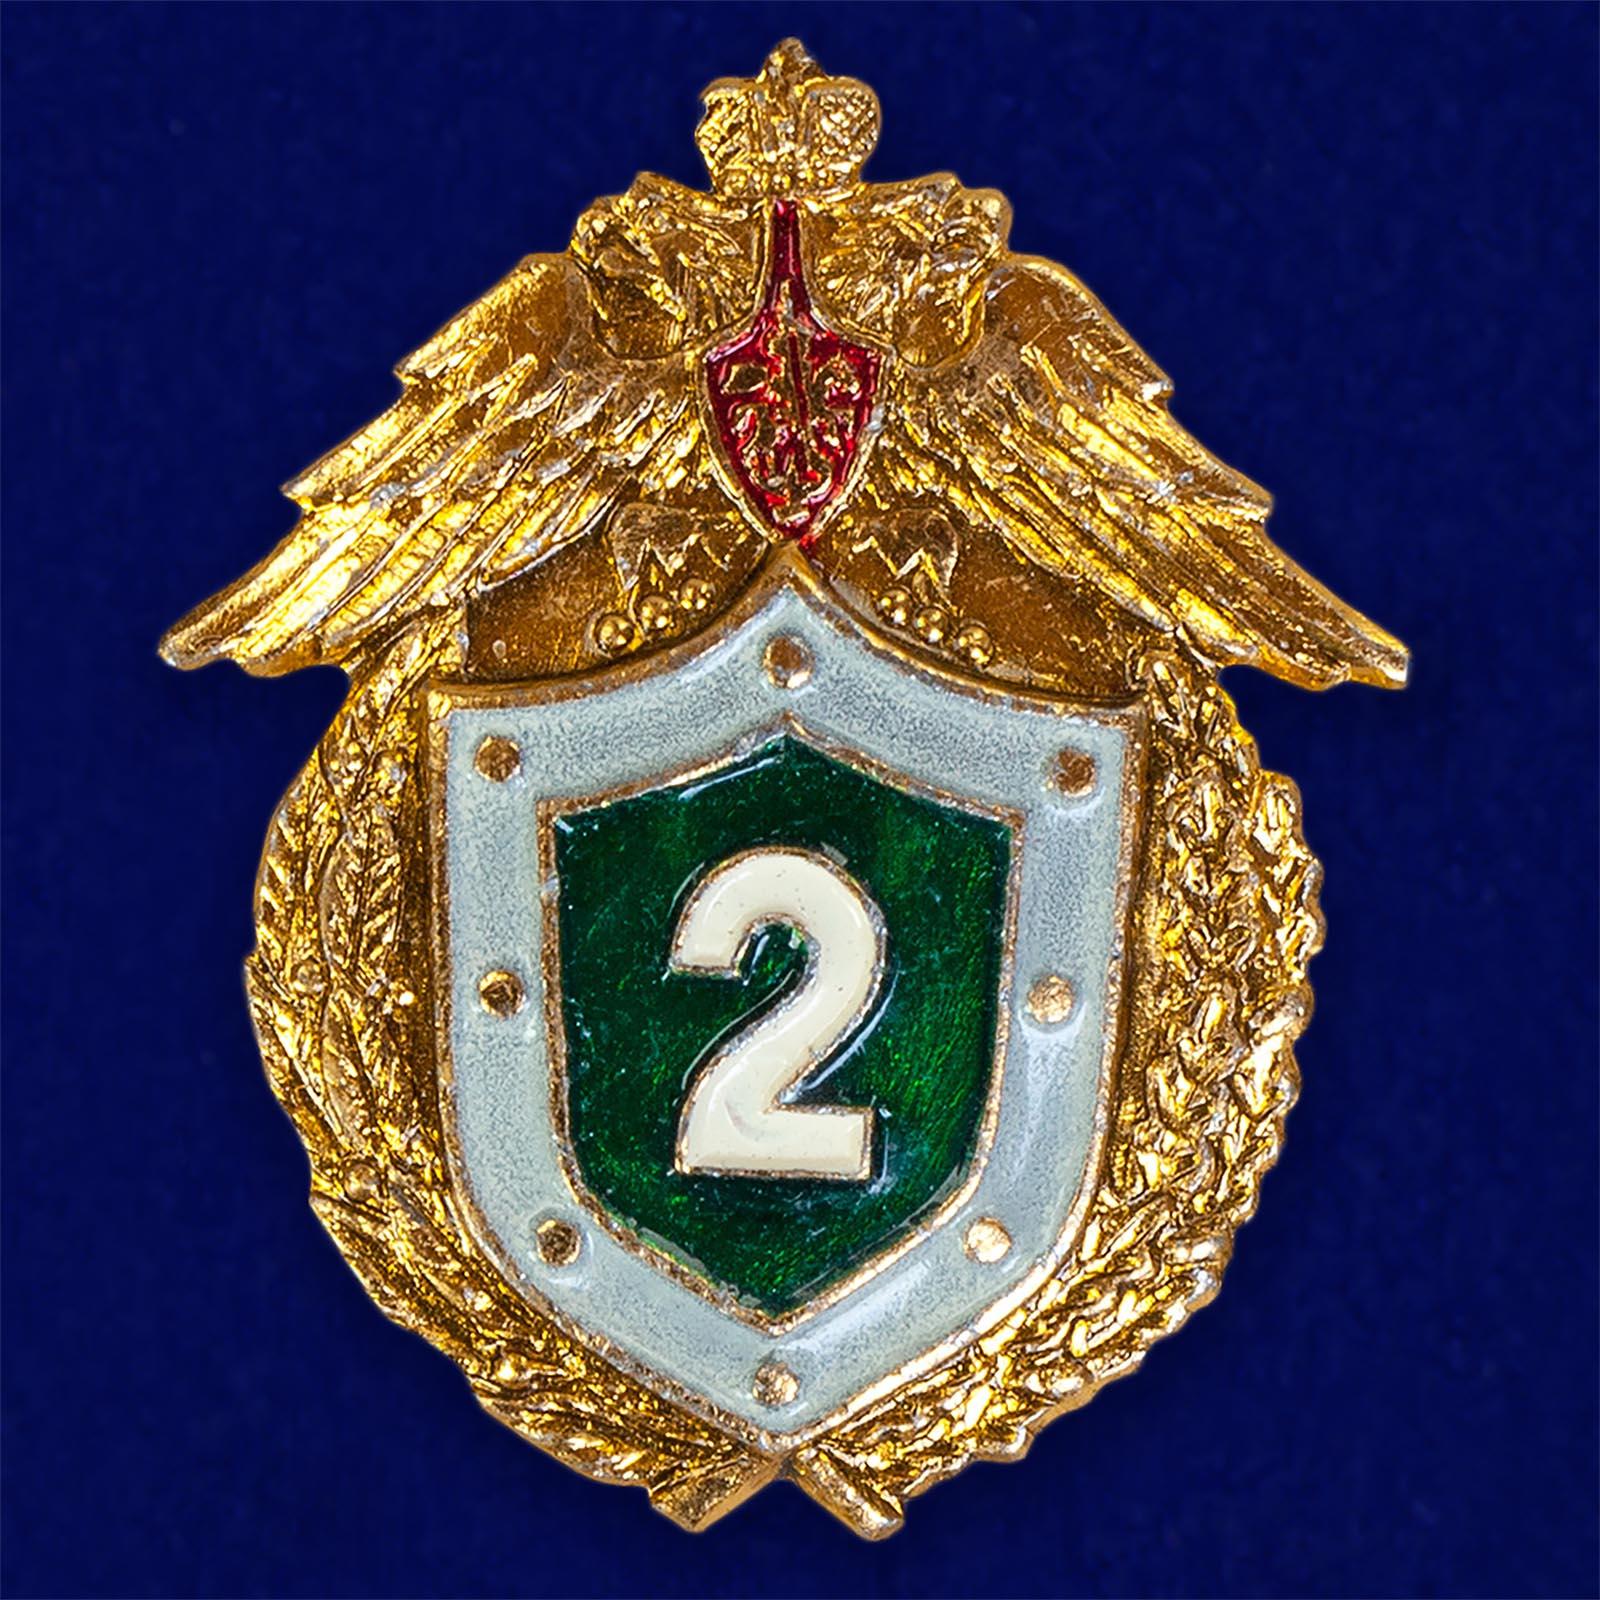 Знак ФПС РФ Специалист 2-го класса в бархатном футляре - Аверс